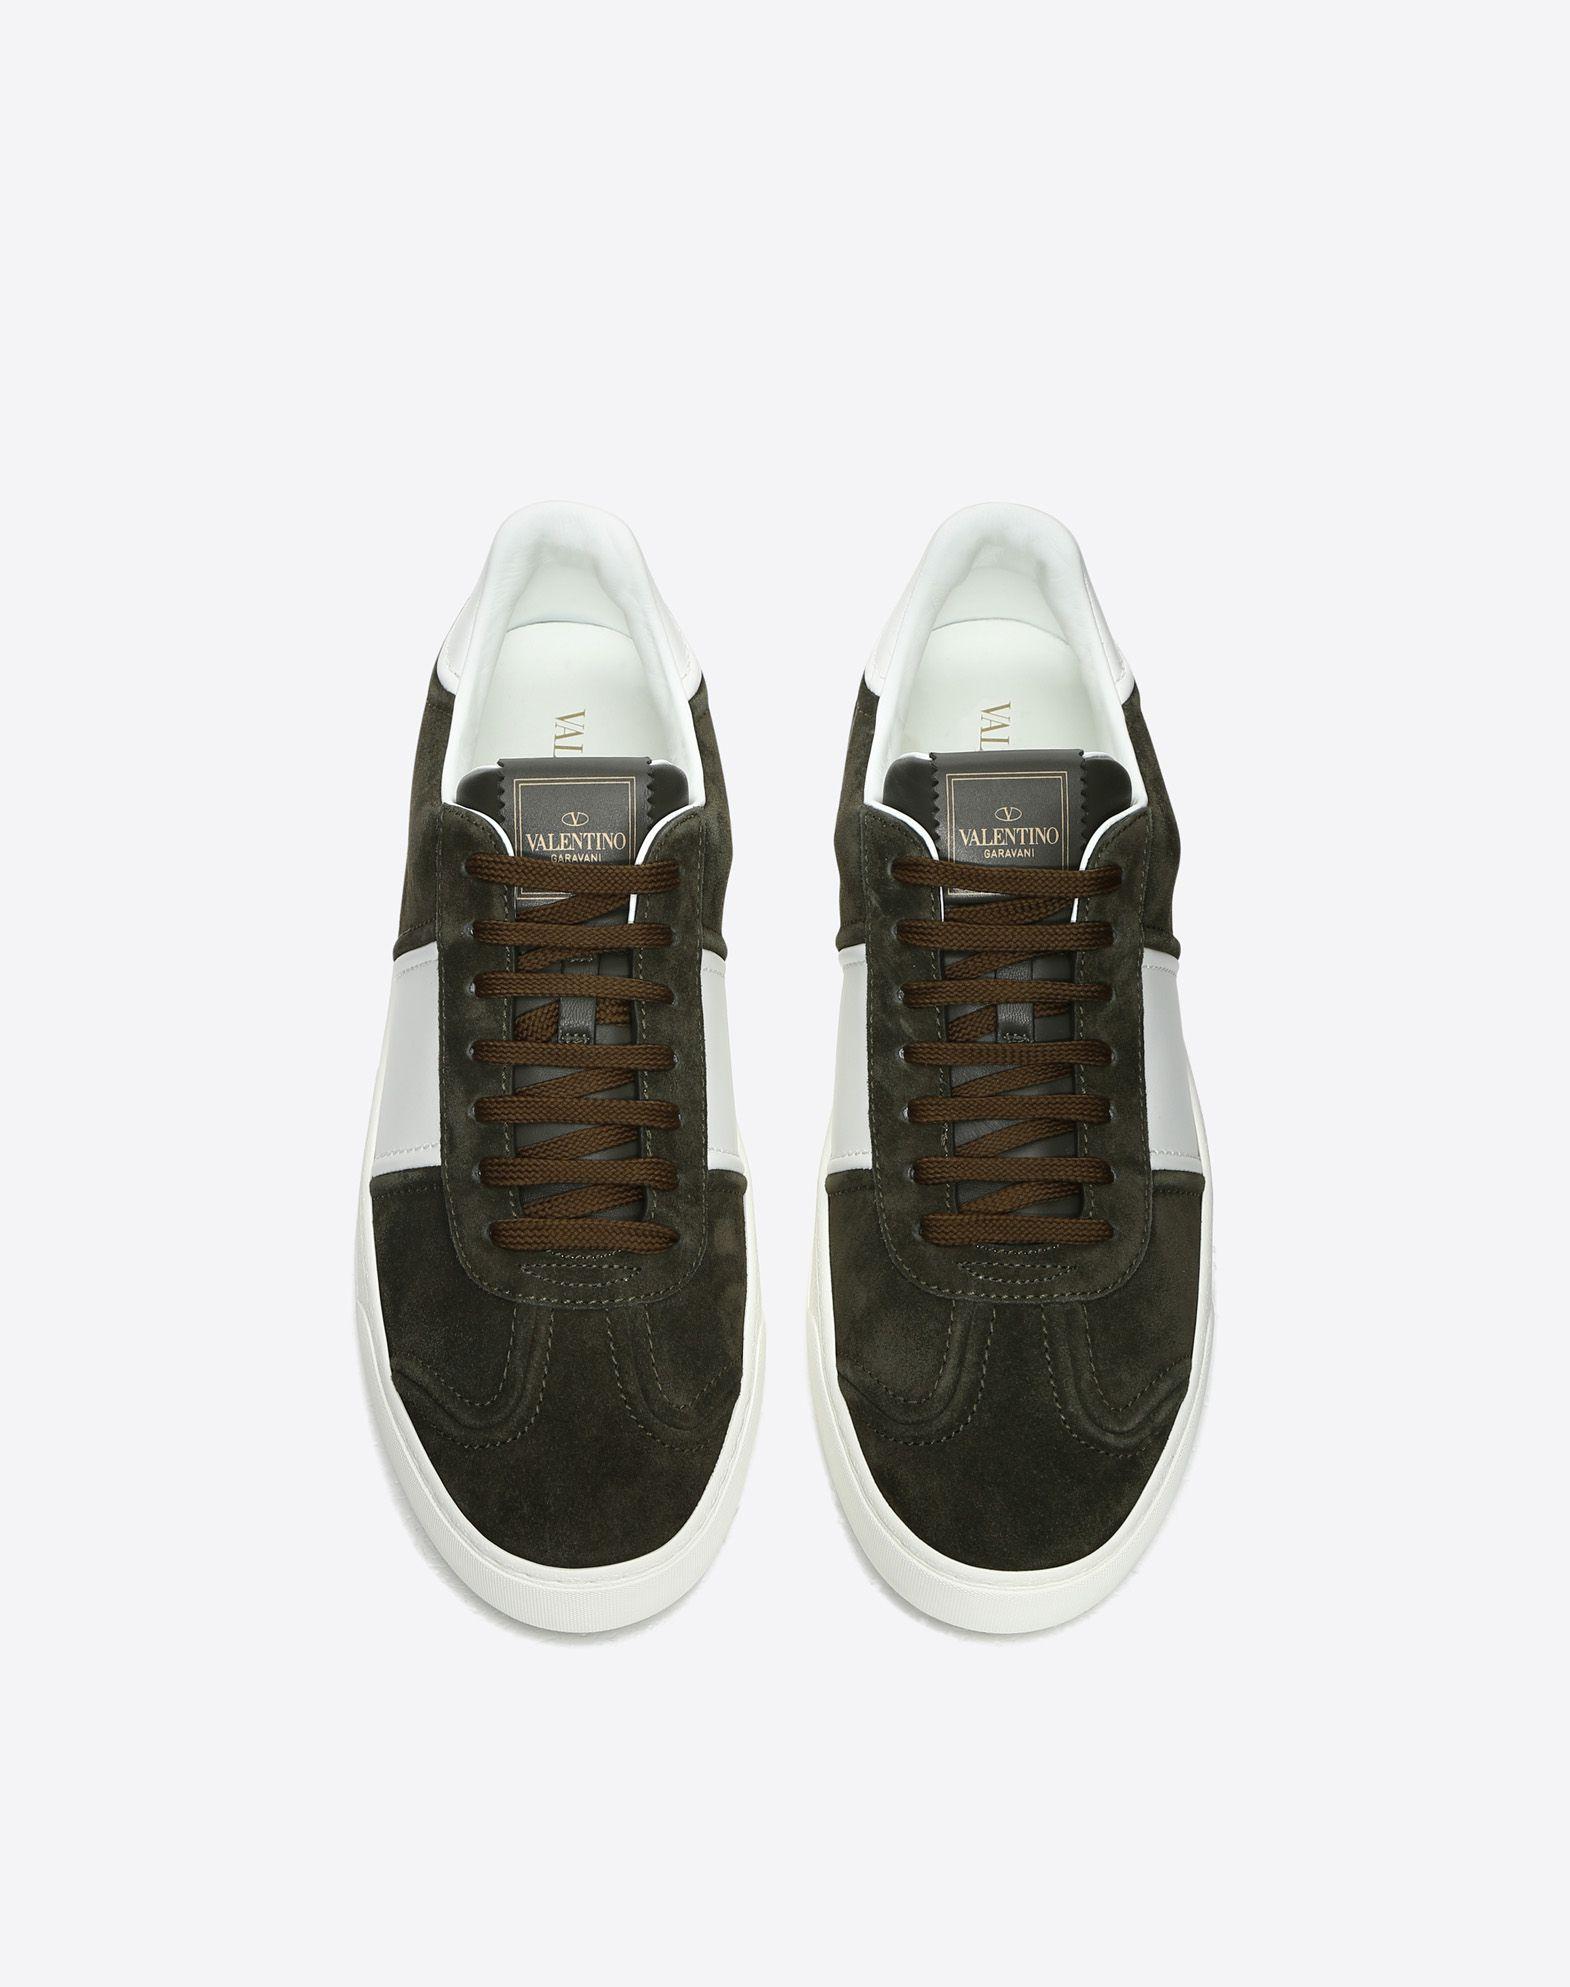 VALENTINO GARAVANI UOMO Sneaker Flycrew LOW-TOP SNEAKERS U e